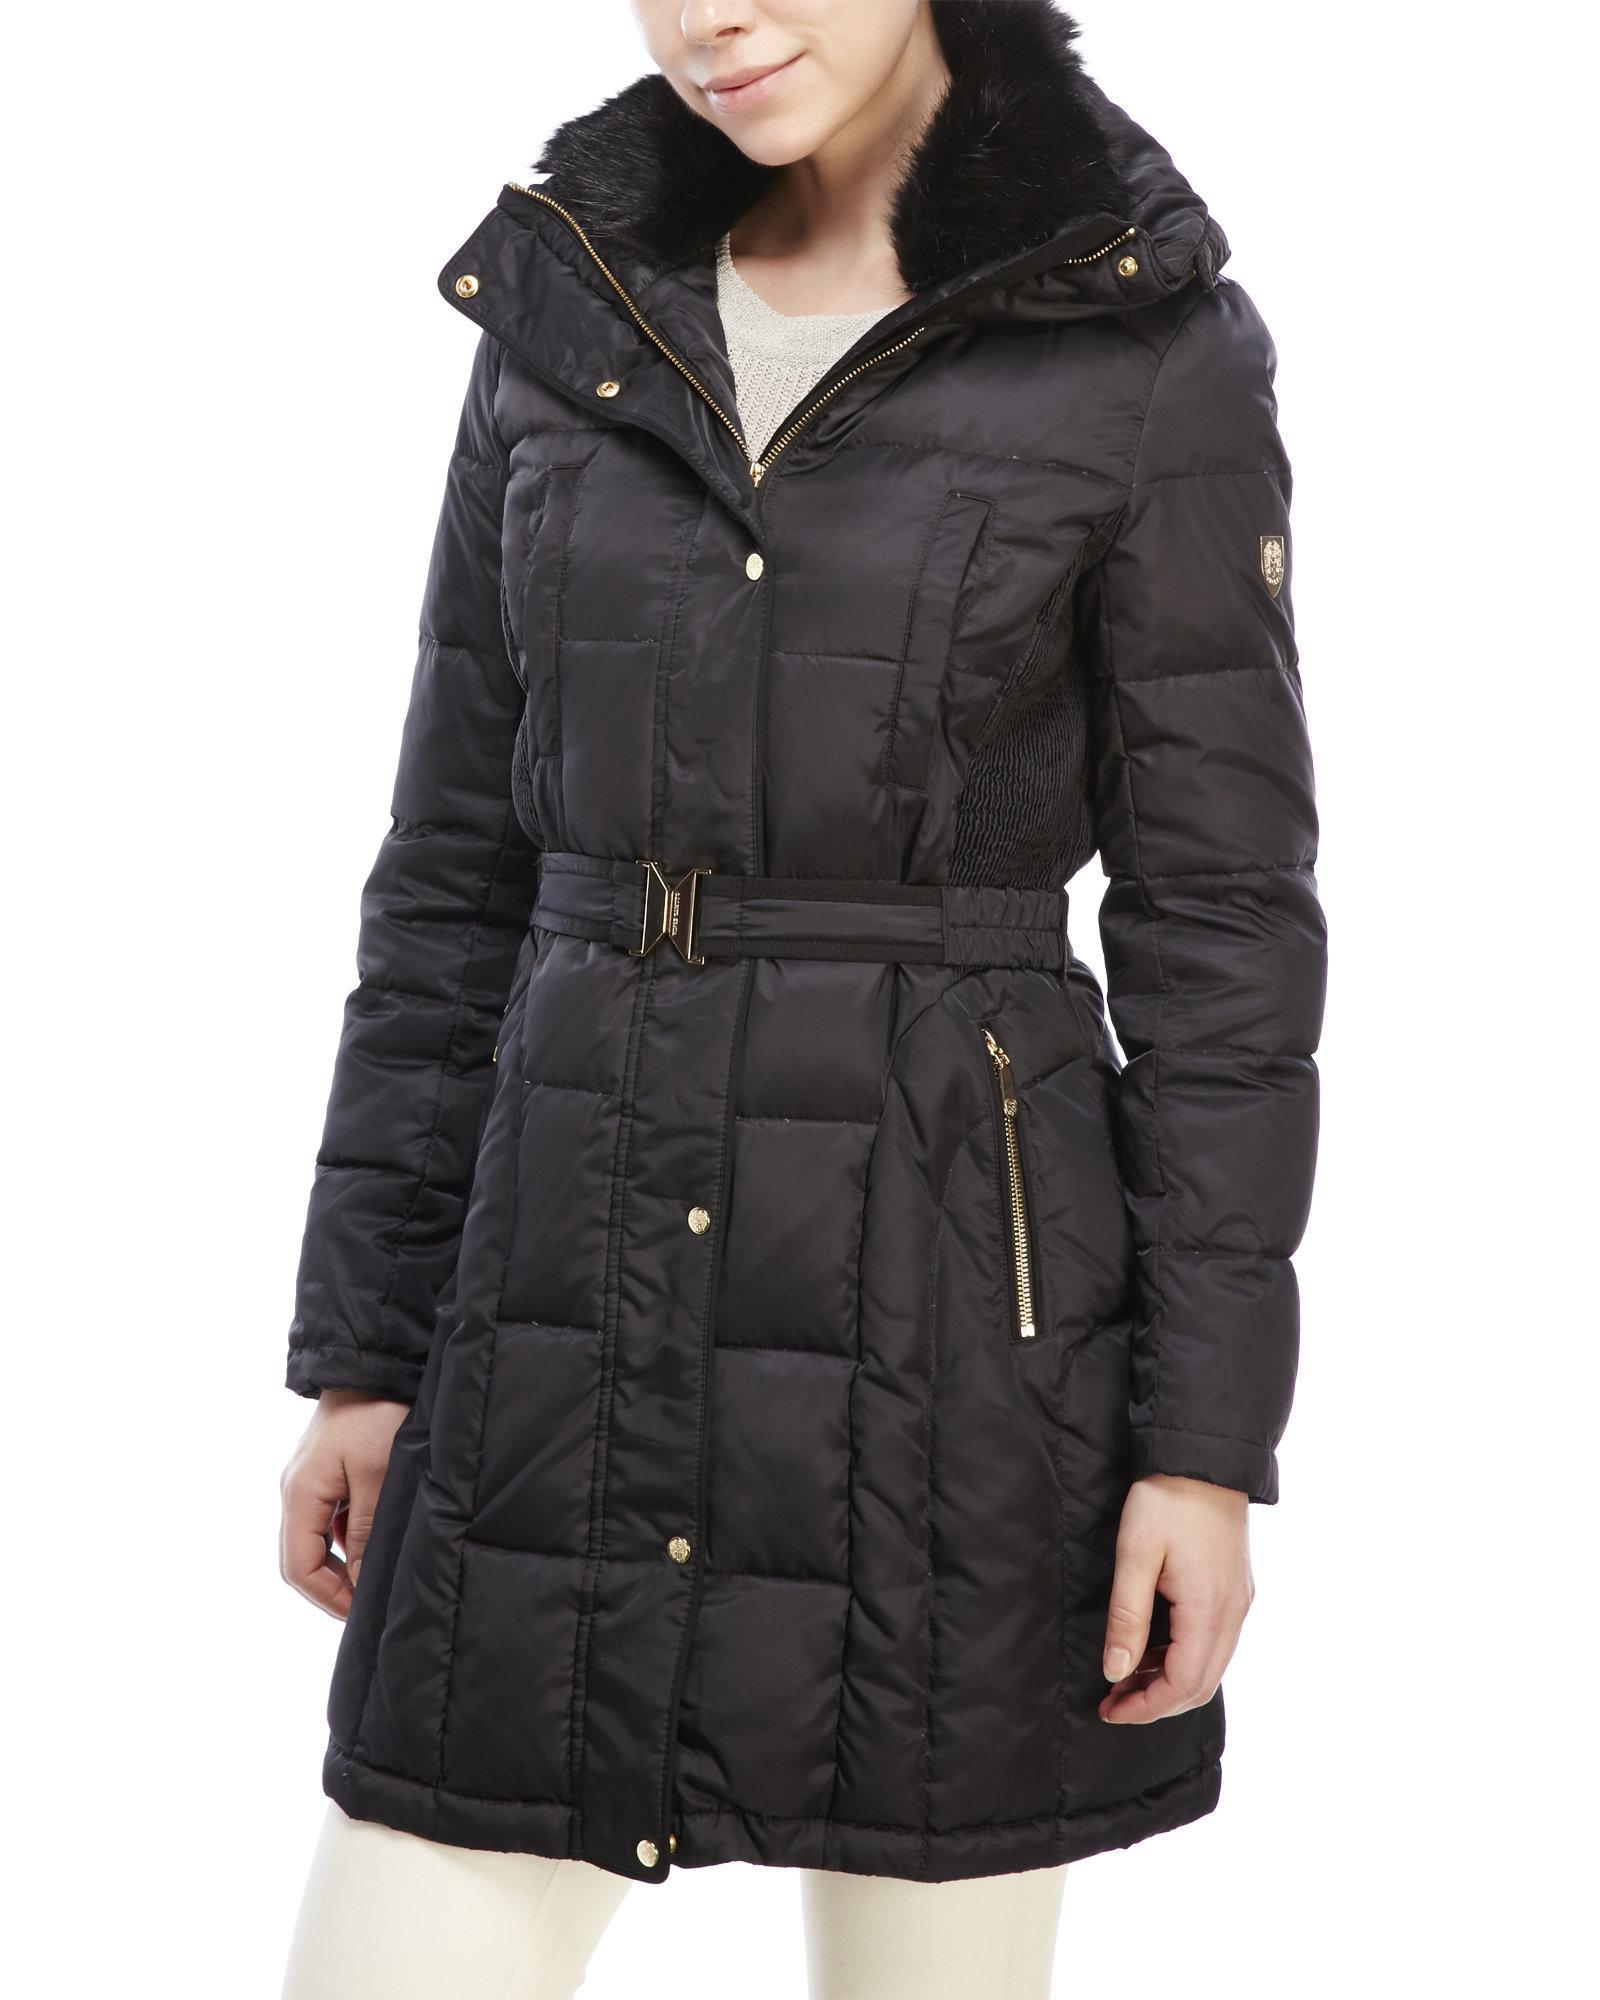 London Fog Stand Collar Coat